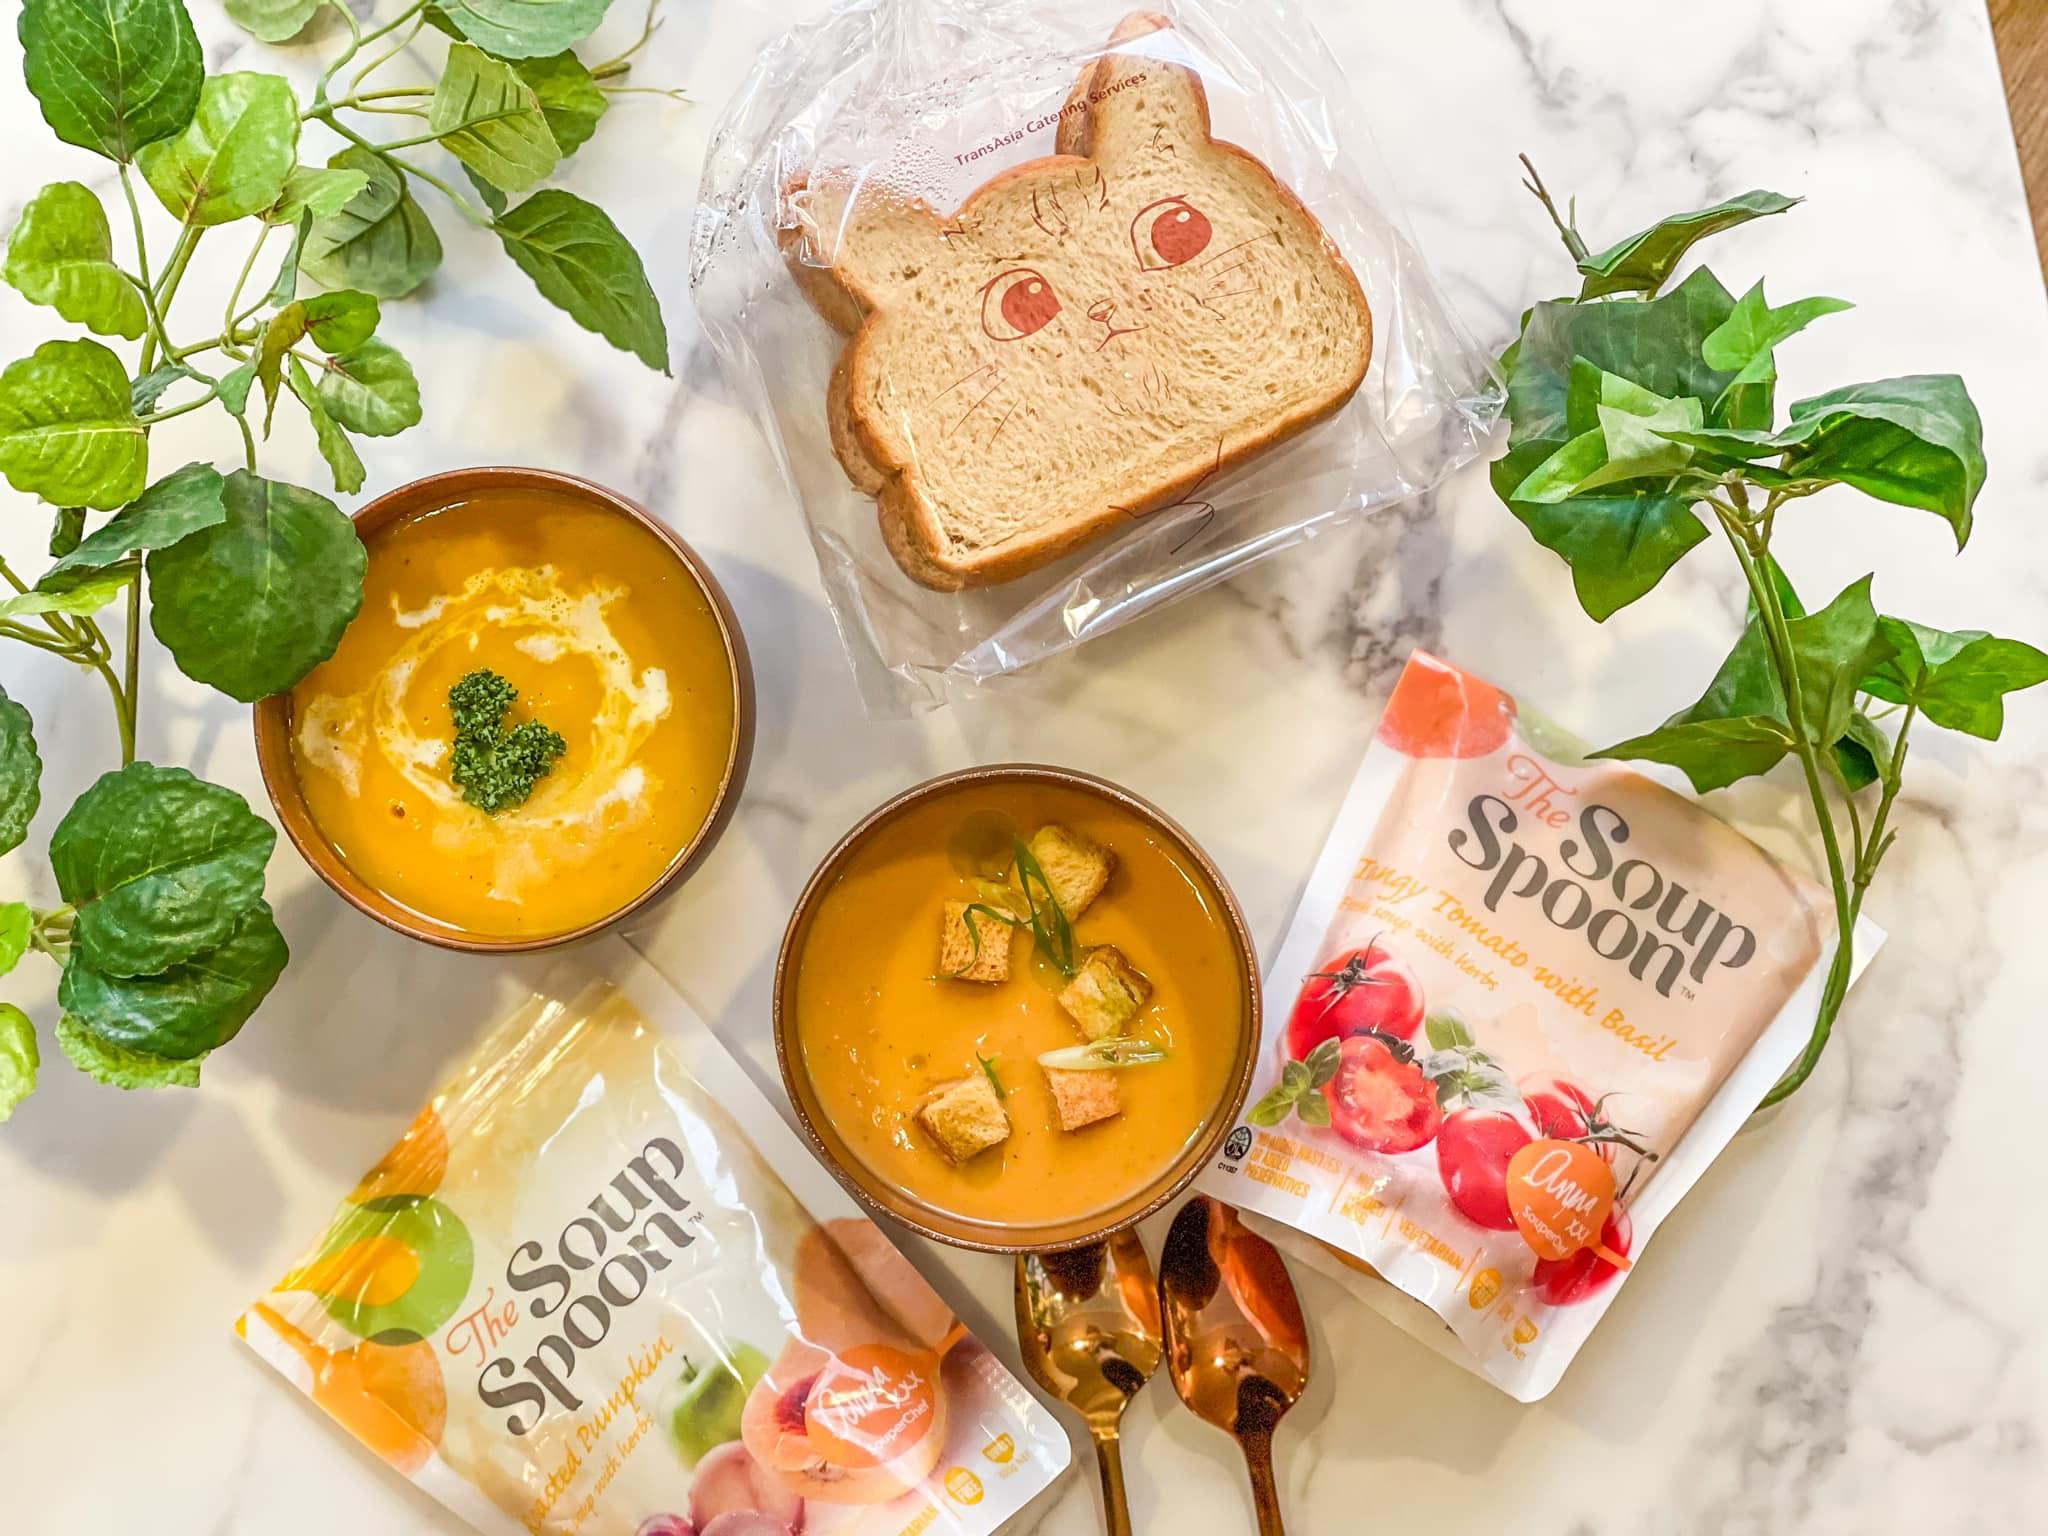 The Soup Spoon 匙碗湯